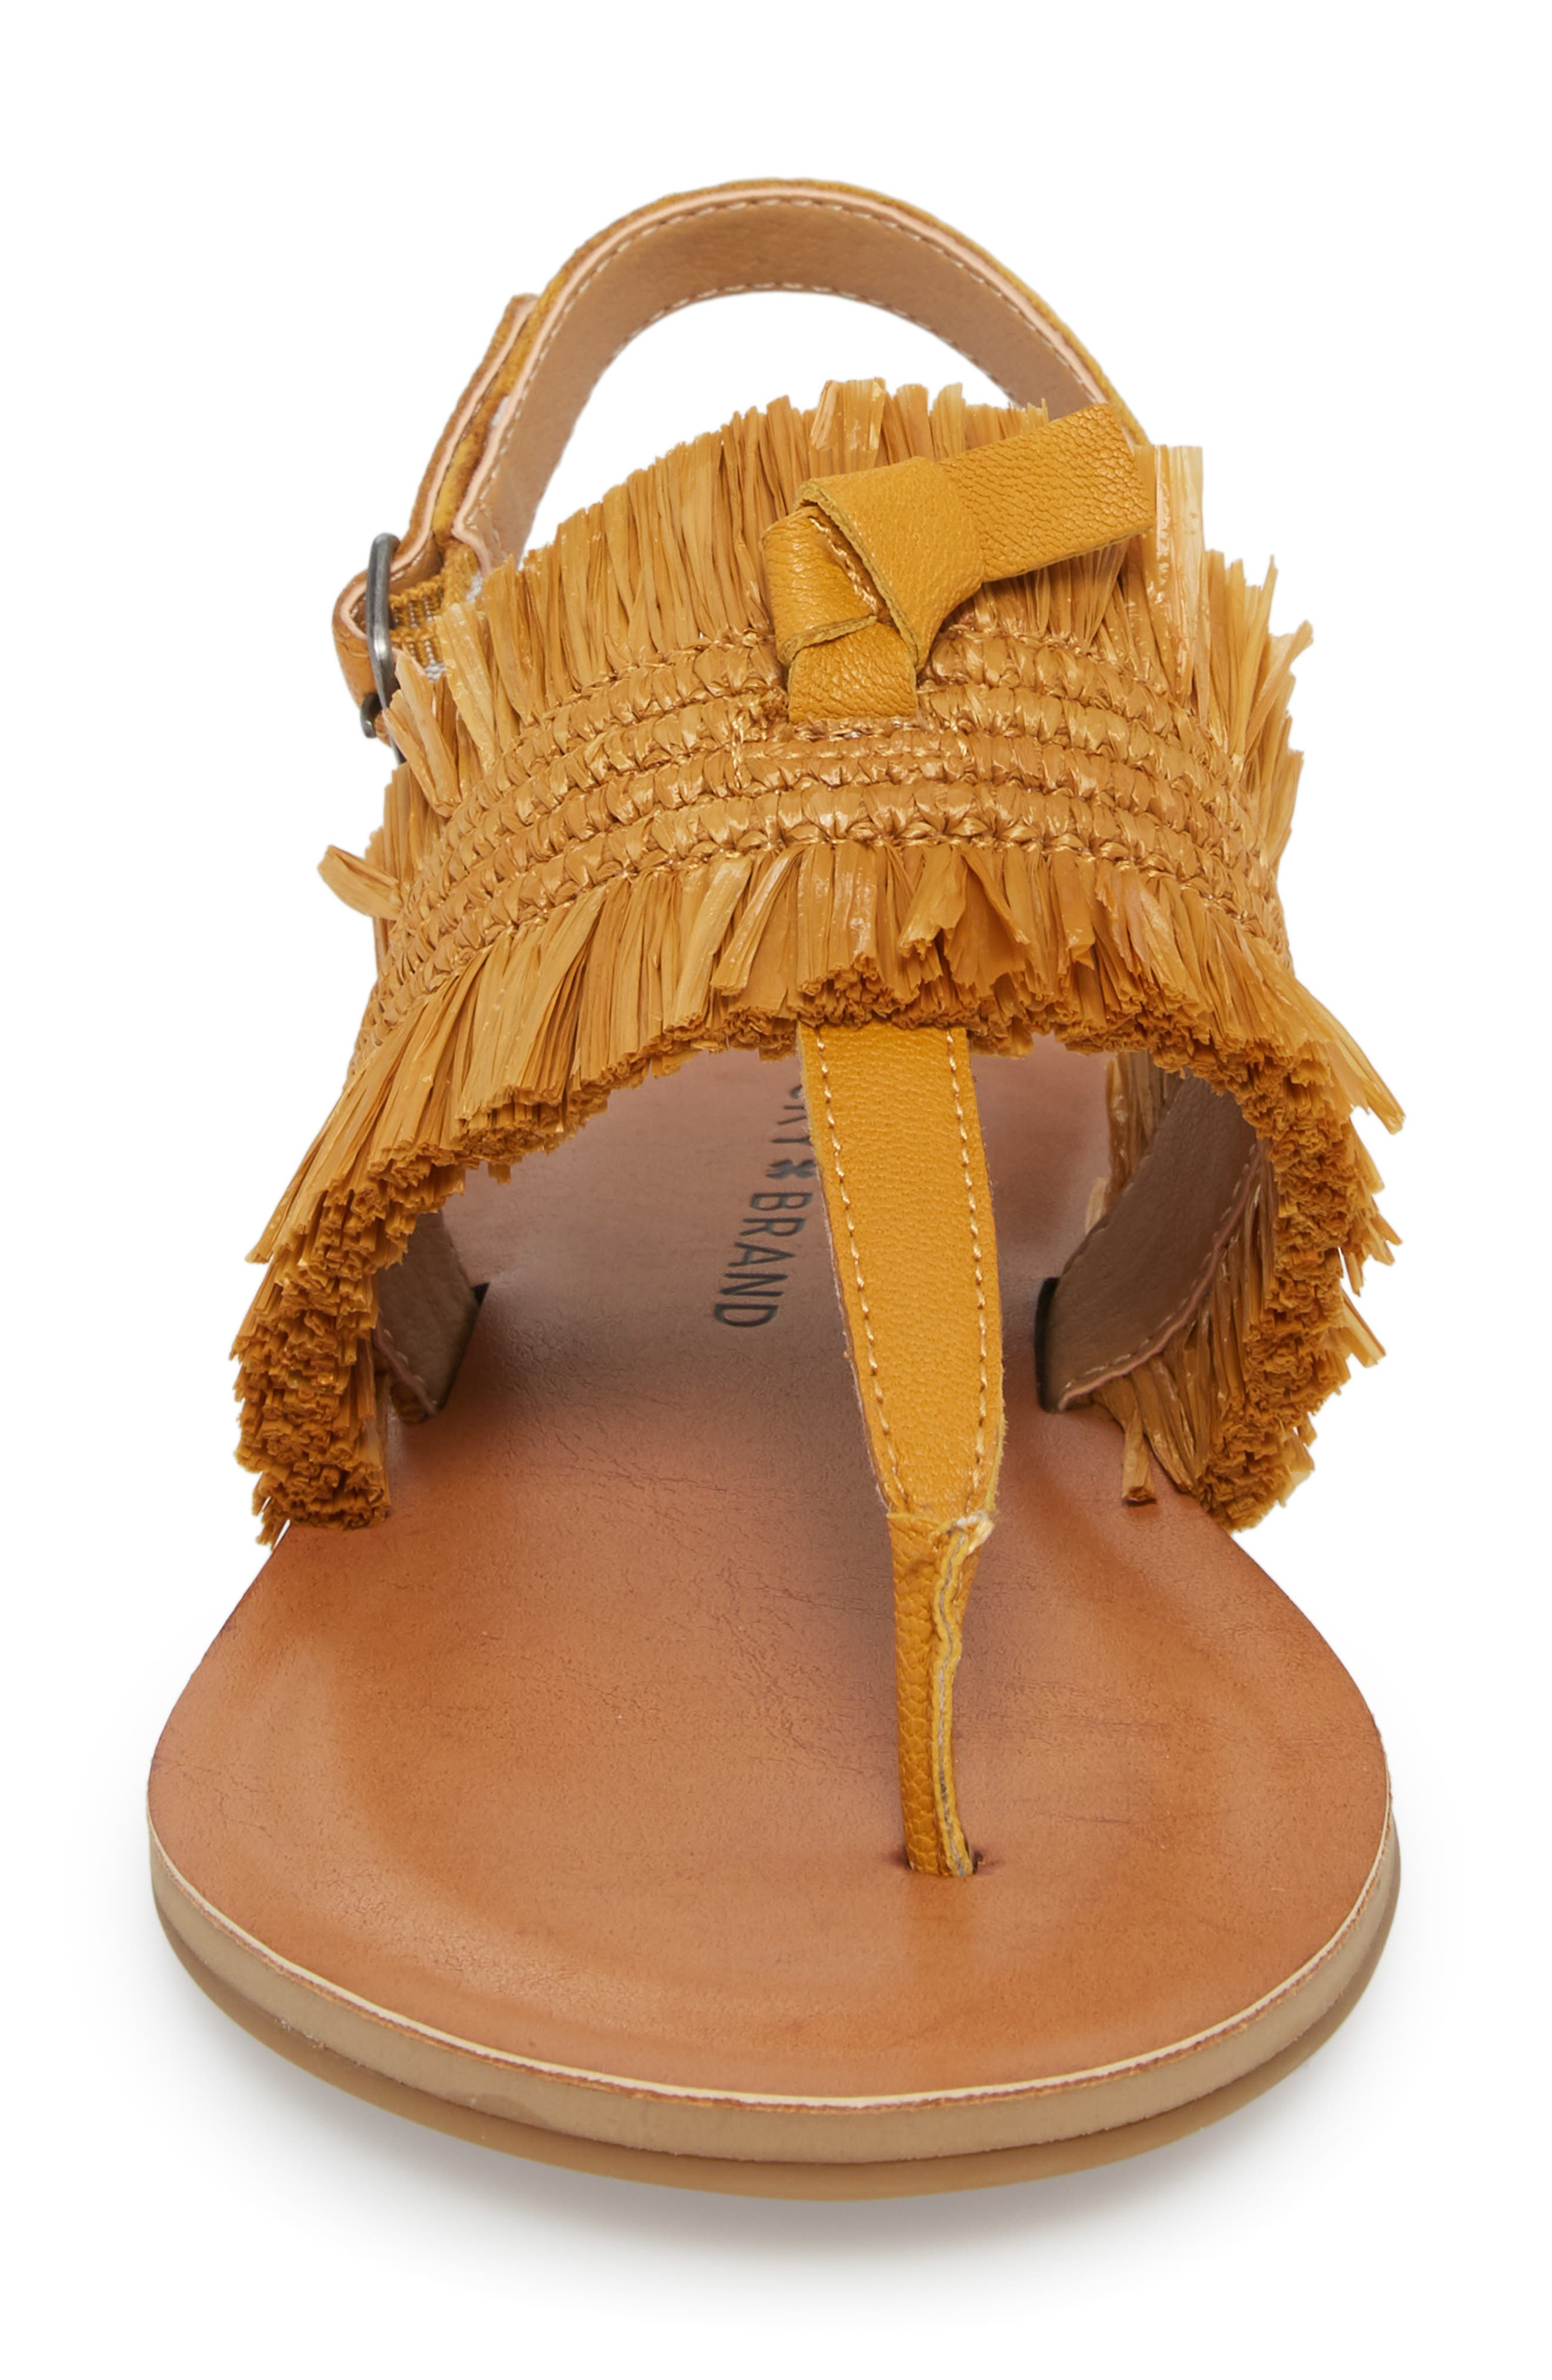 Akerlei Sandal,                             Alternate thumbnail 4, color,                             Saffron Leather